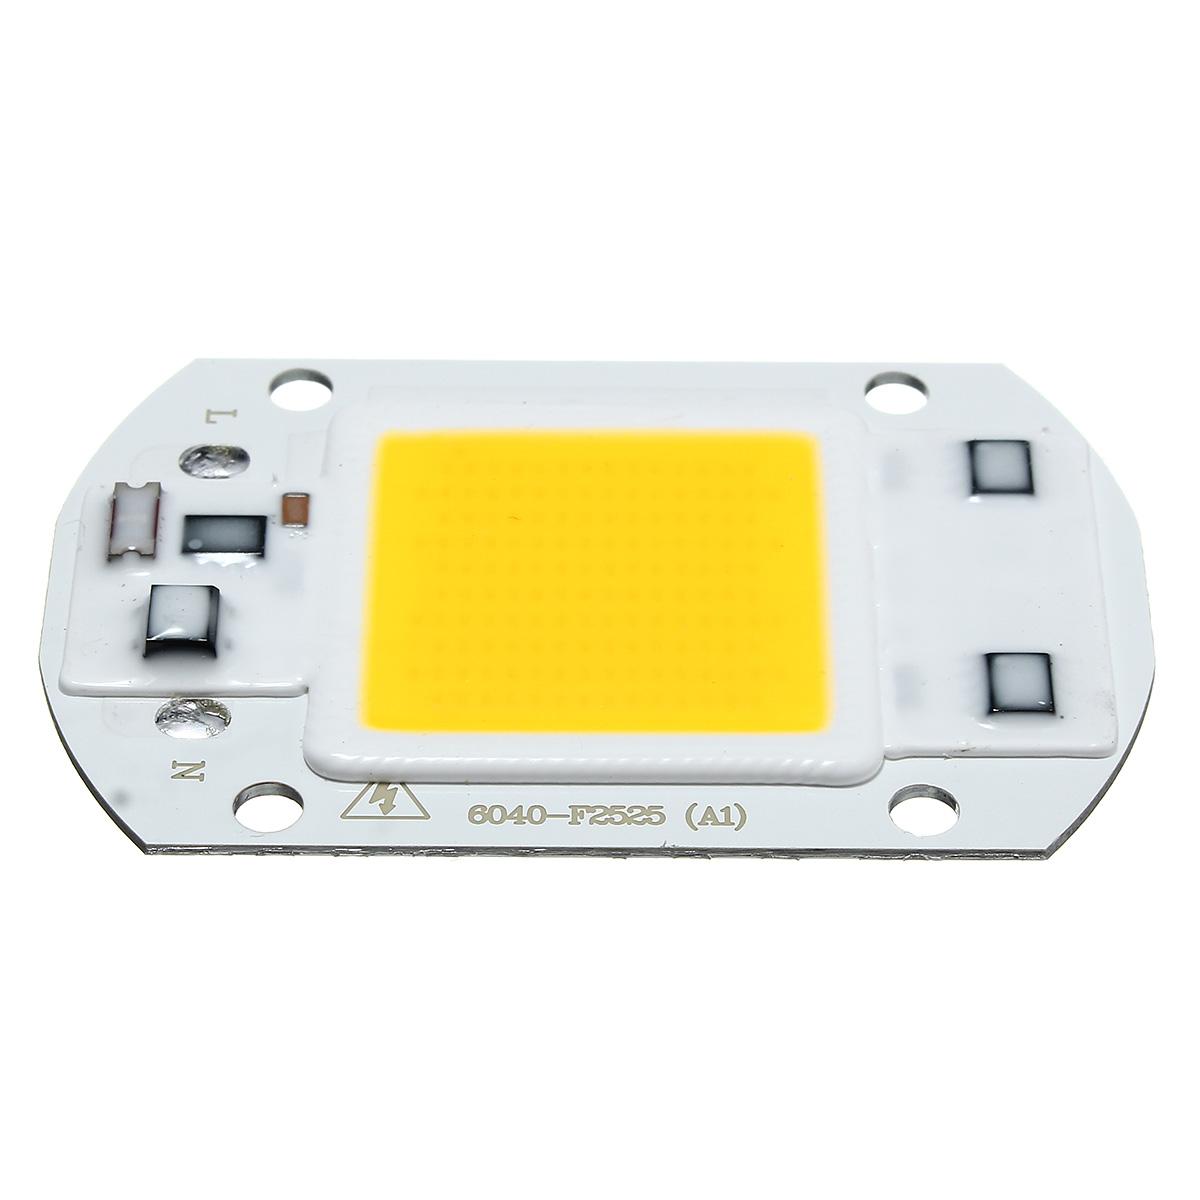 40 X 60MM 30W 2600LM Warm/White DIY COB LED Chip Bulb Bead For Flood Light AC110/220V